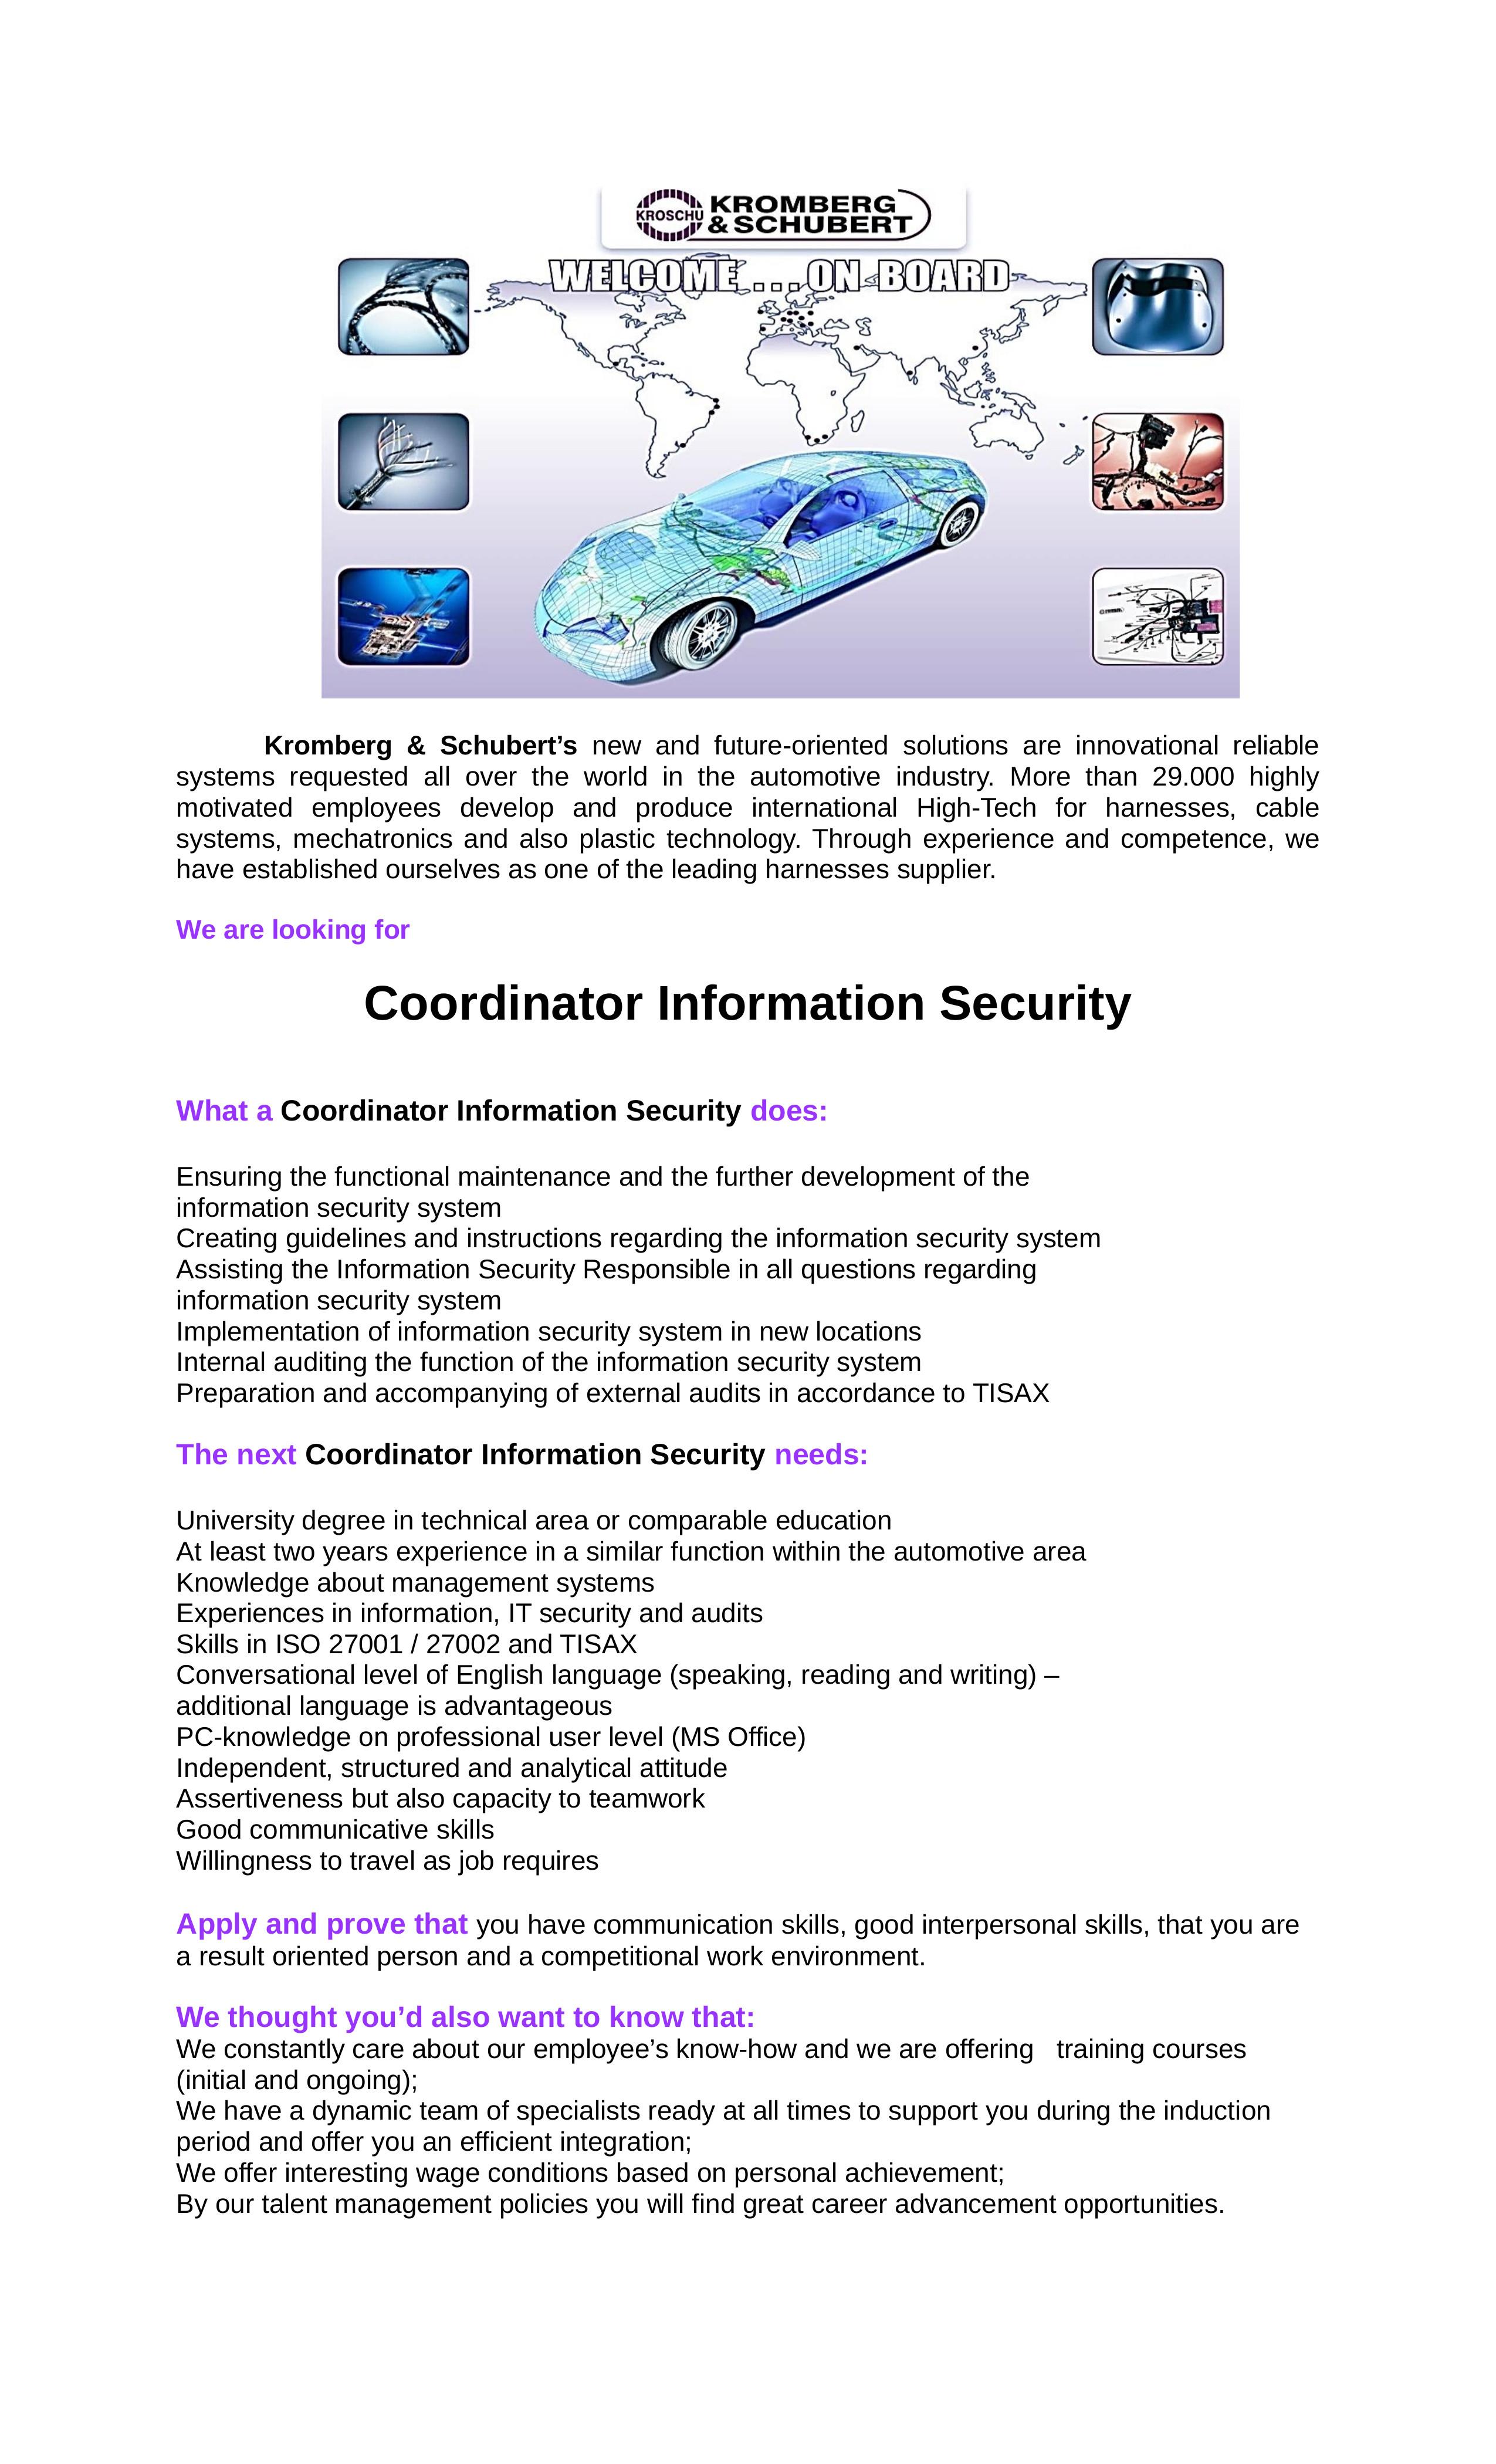 Coordinator Information Security